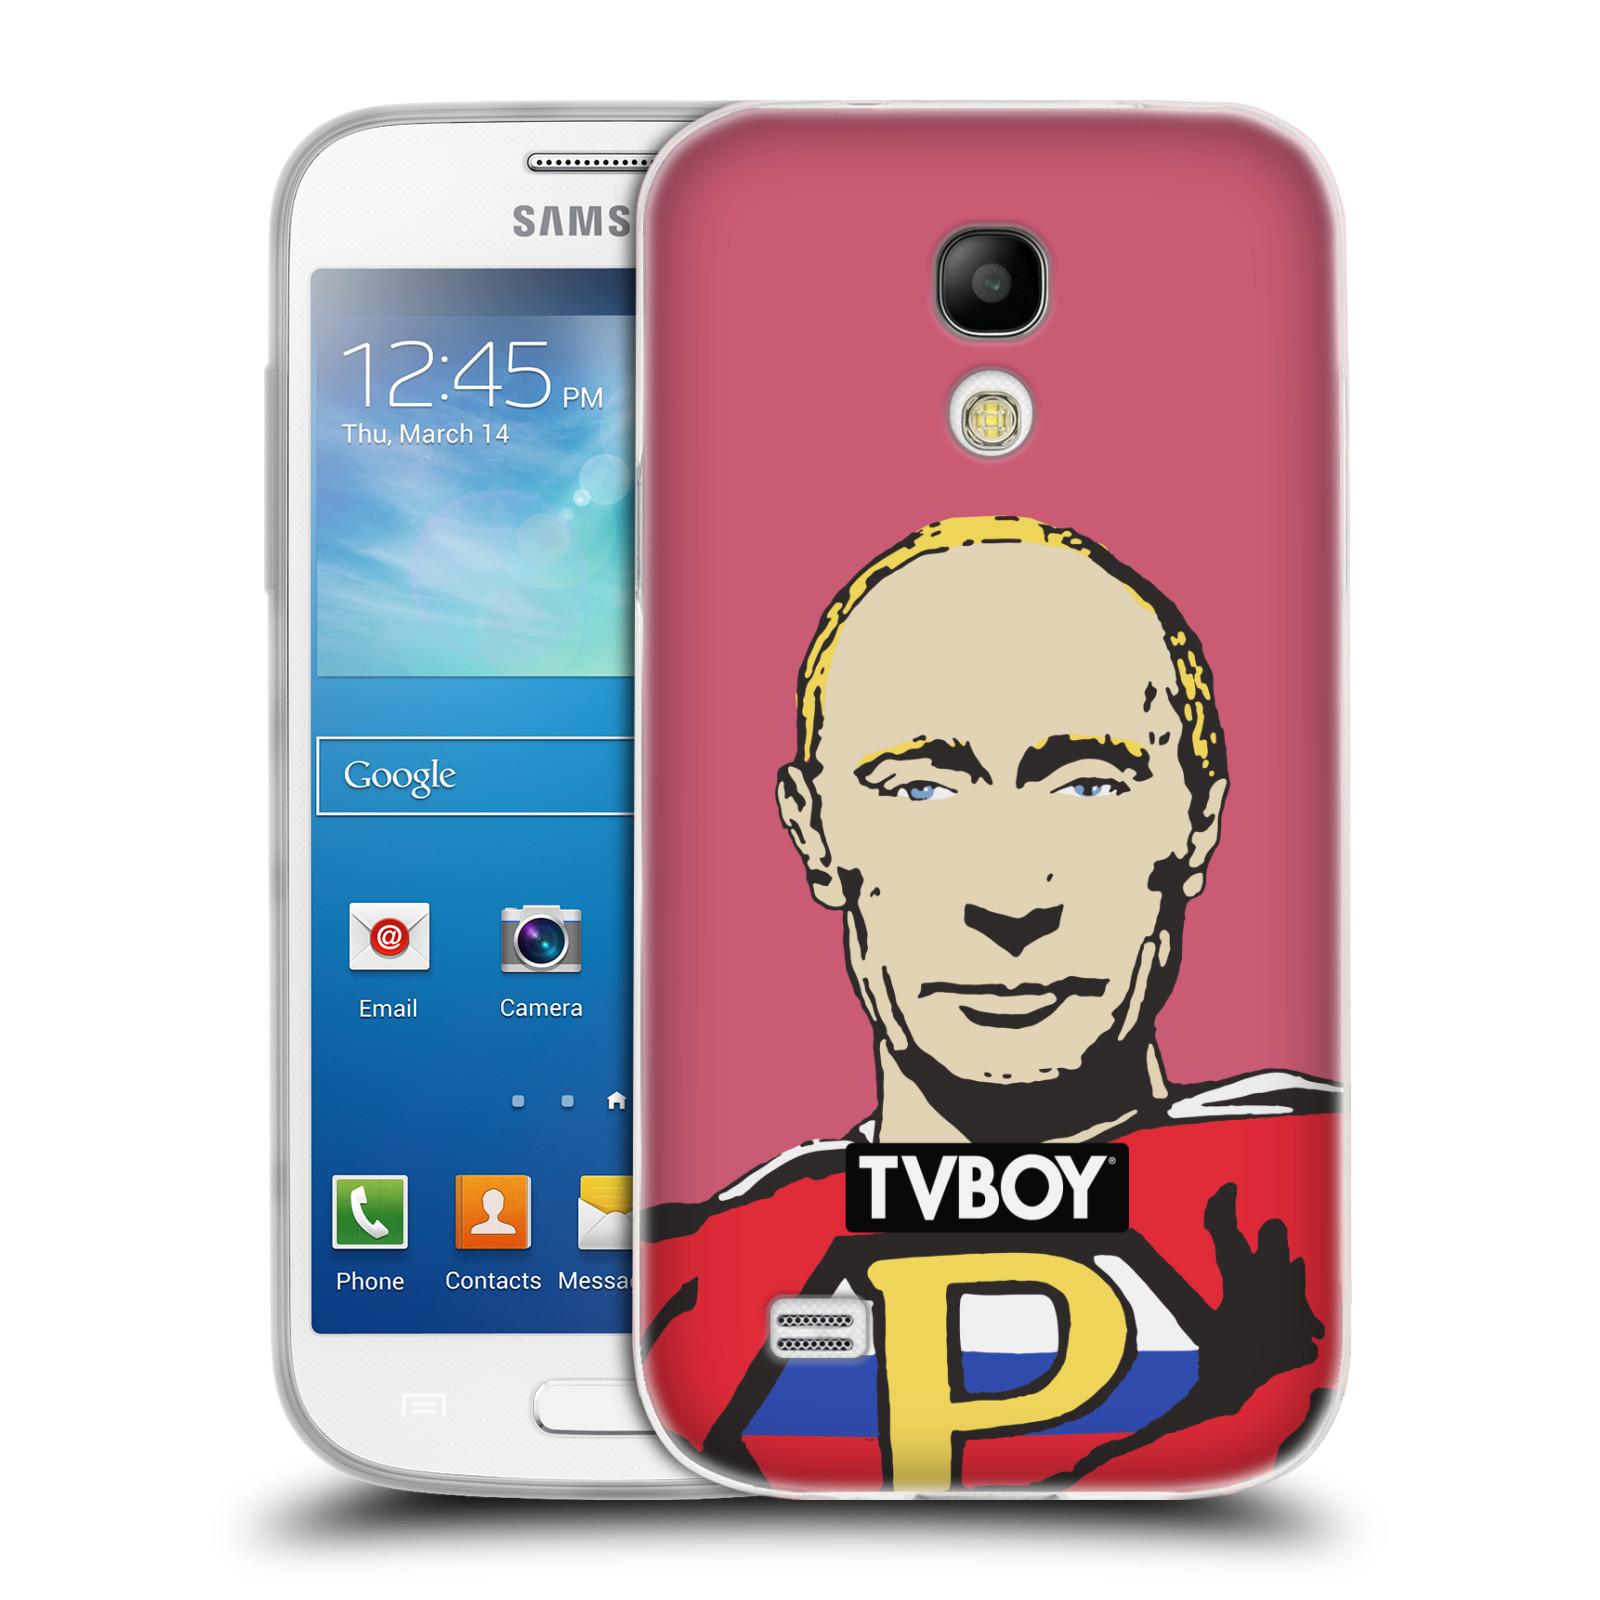 Silikonové pouzdro na mobil Samsung Galaxy S4 Mini HEAD CASE - TVBOY - Super Putin